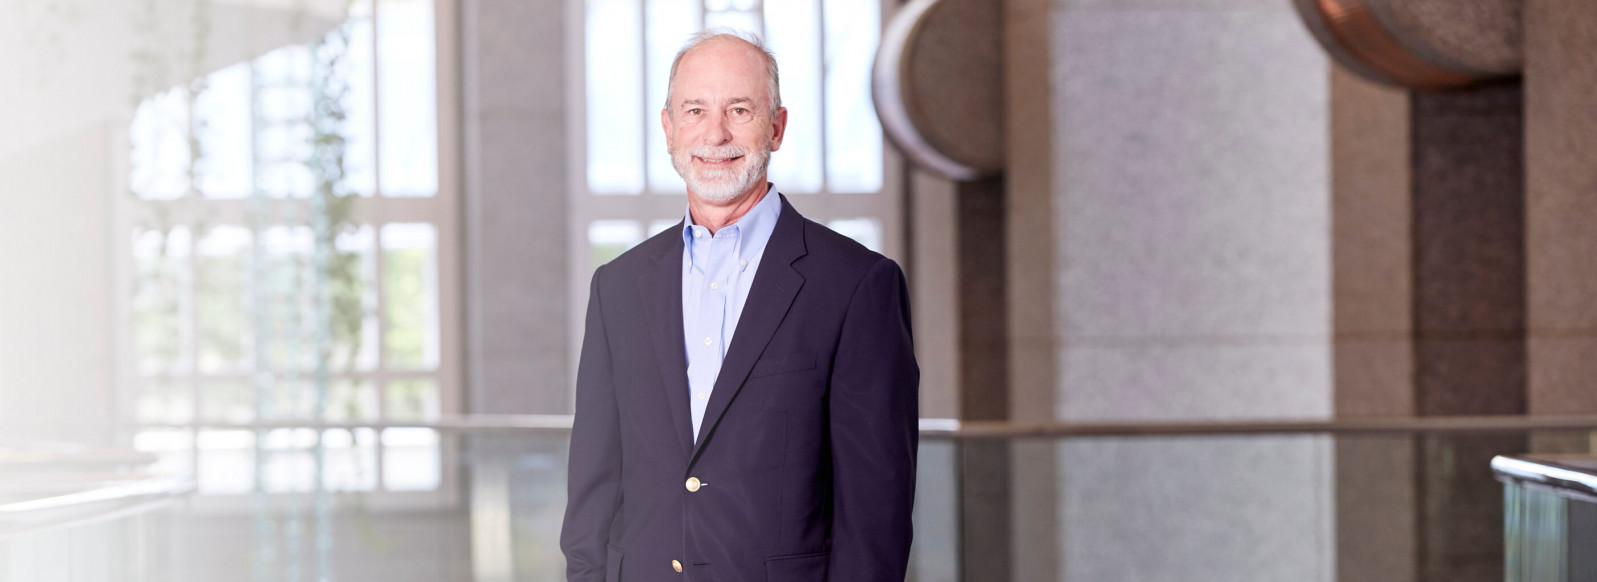 G. Wayne Hillis, Jr.